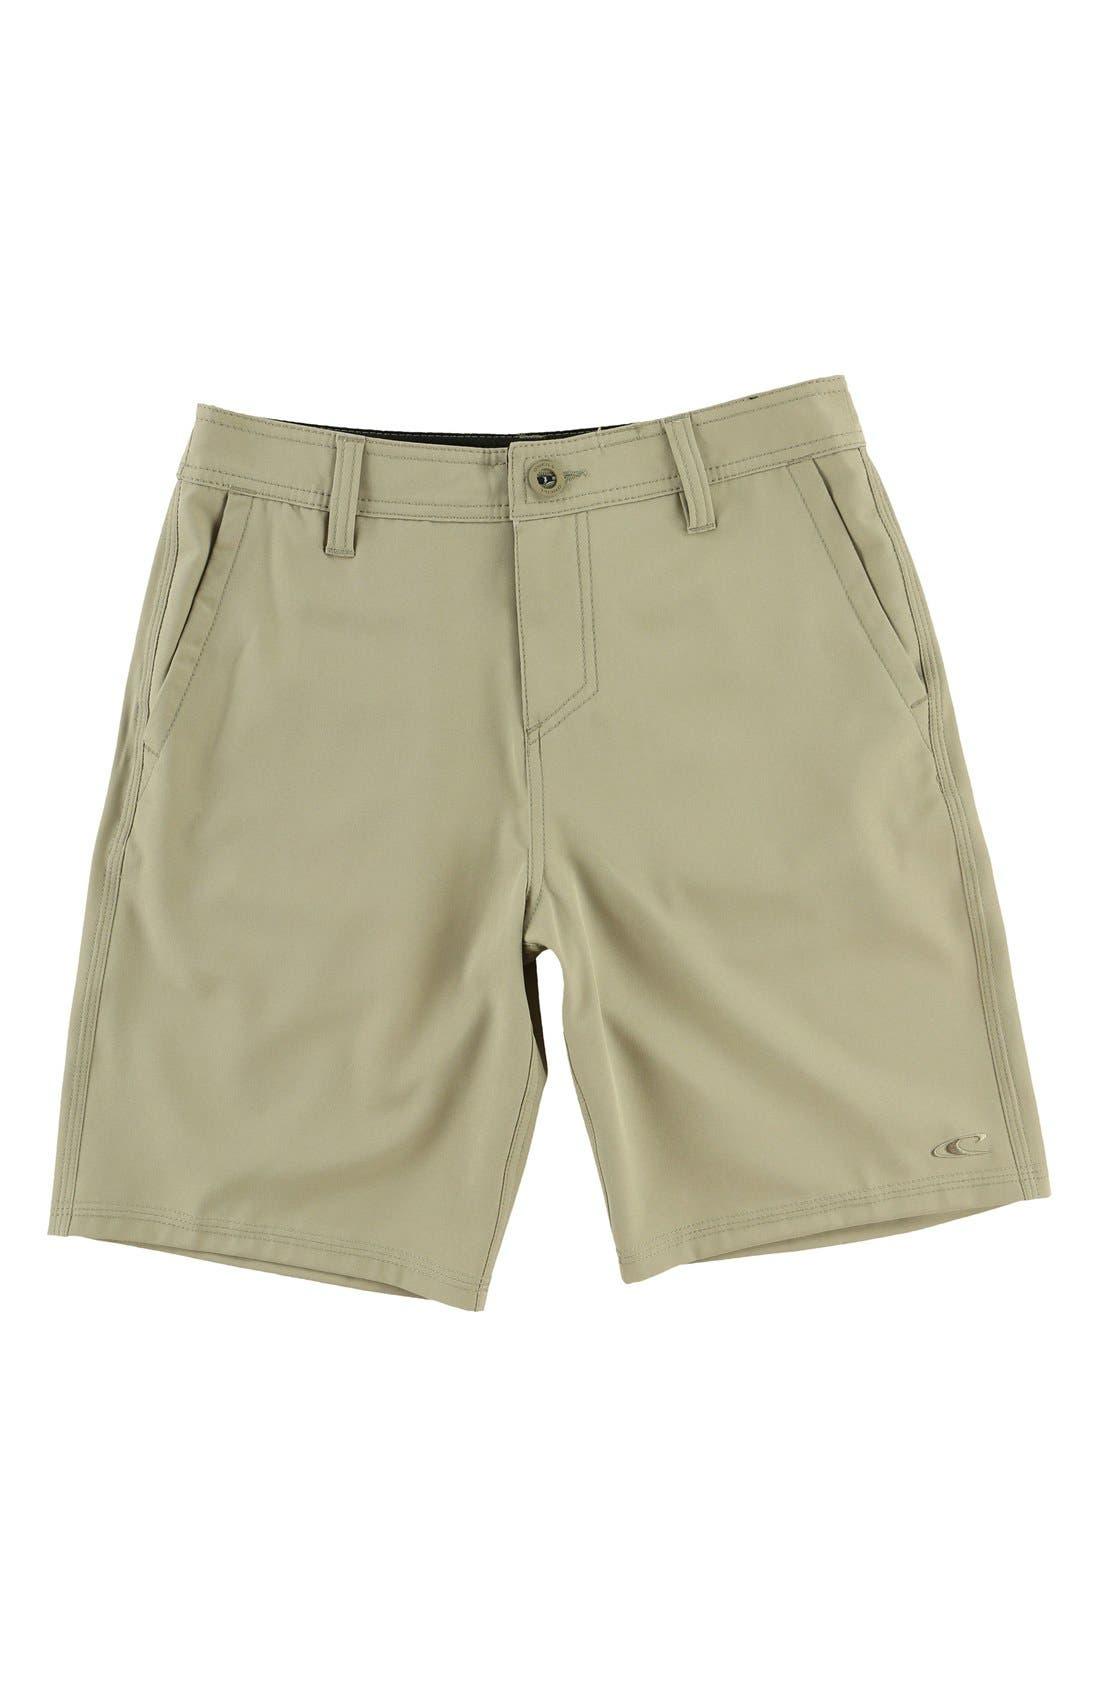 Alternate Image 1 Selected - O'Neill Loaded Hybrid Board Shorts (Big Boys)